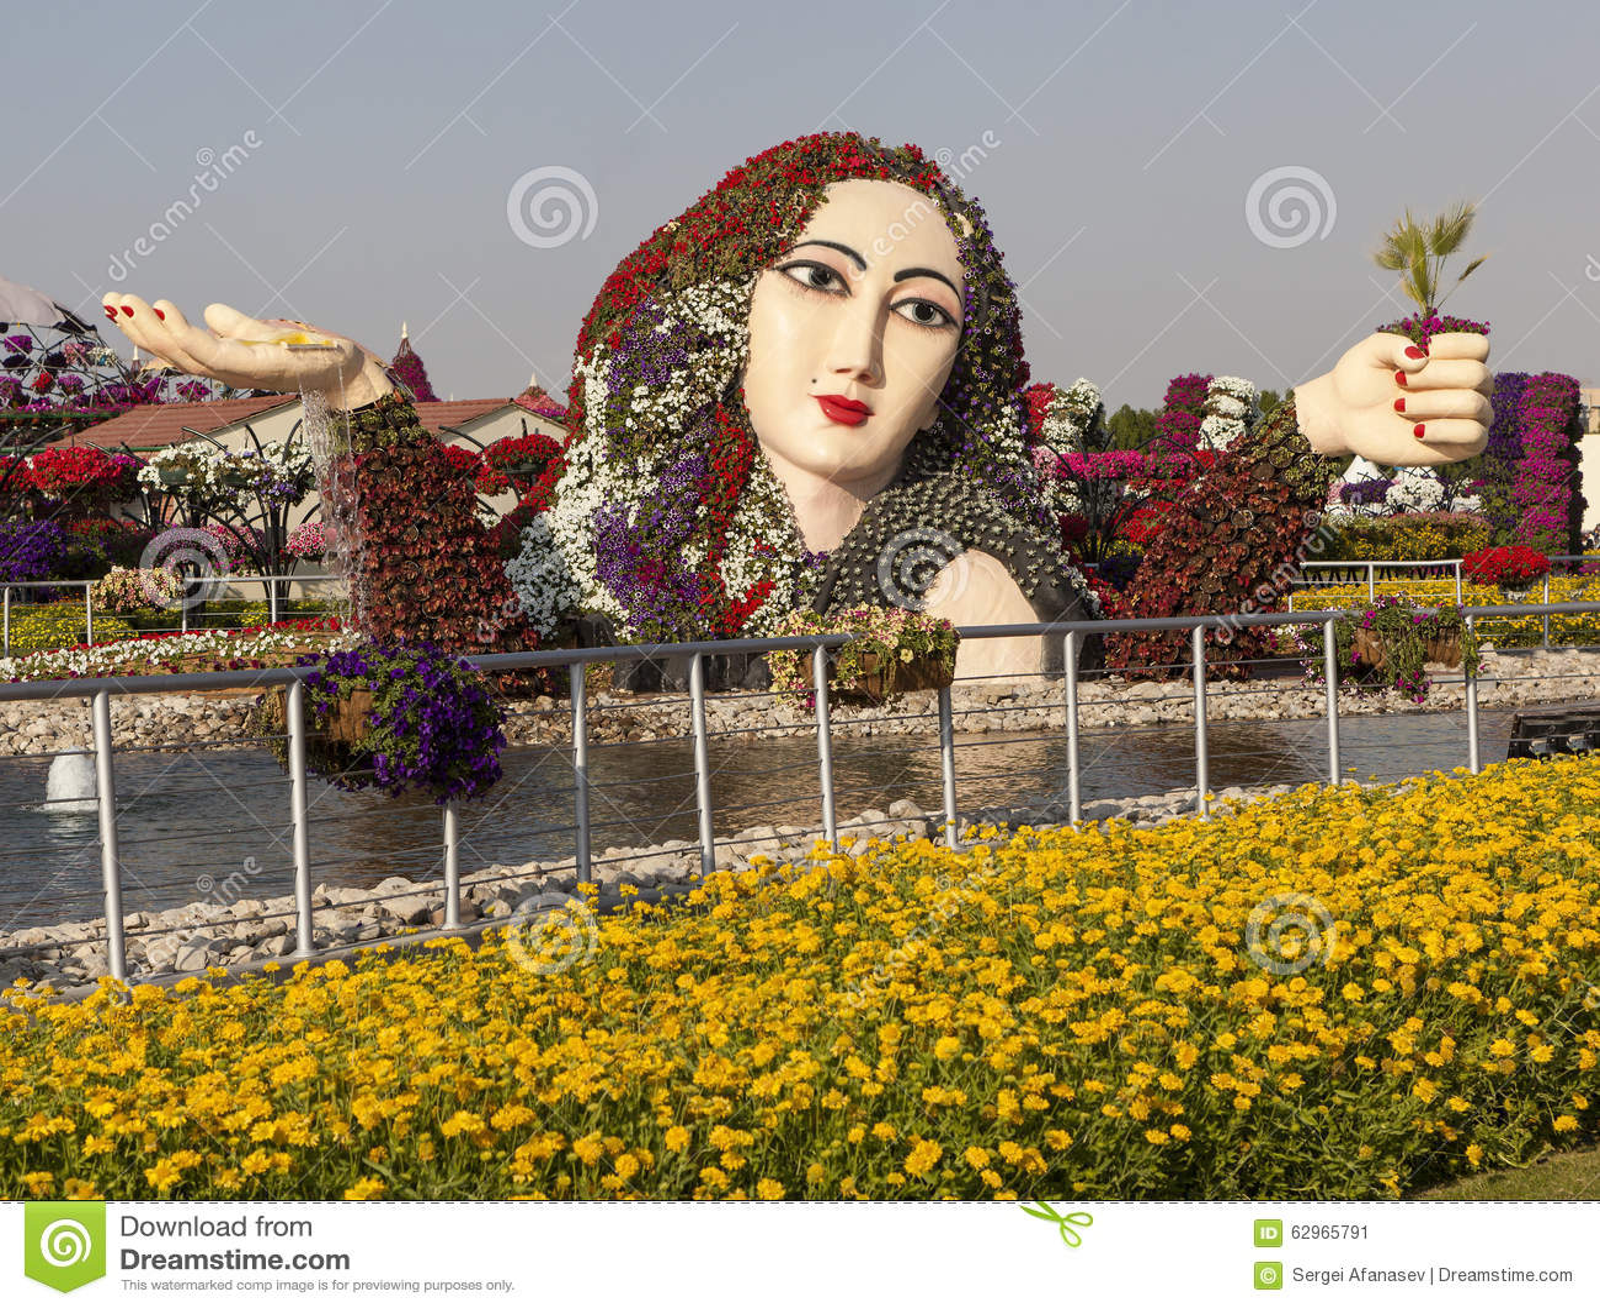 dubai uae december 23 2014 photo of flower park dubai miracle